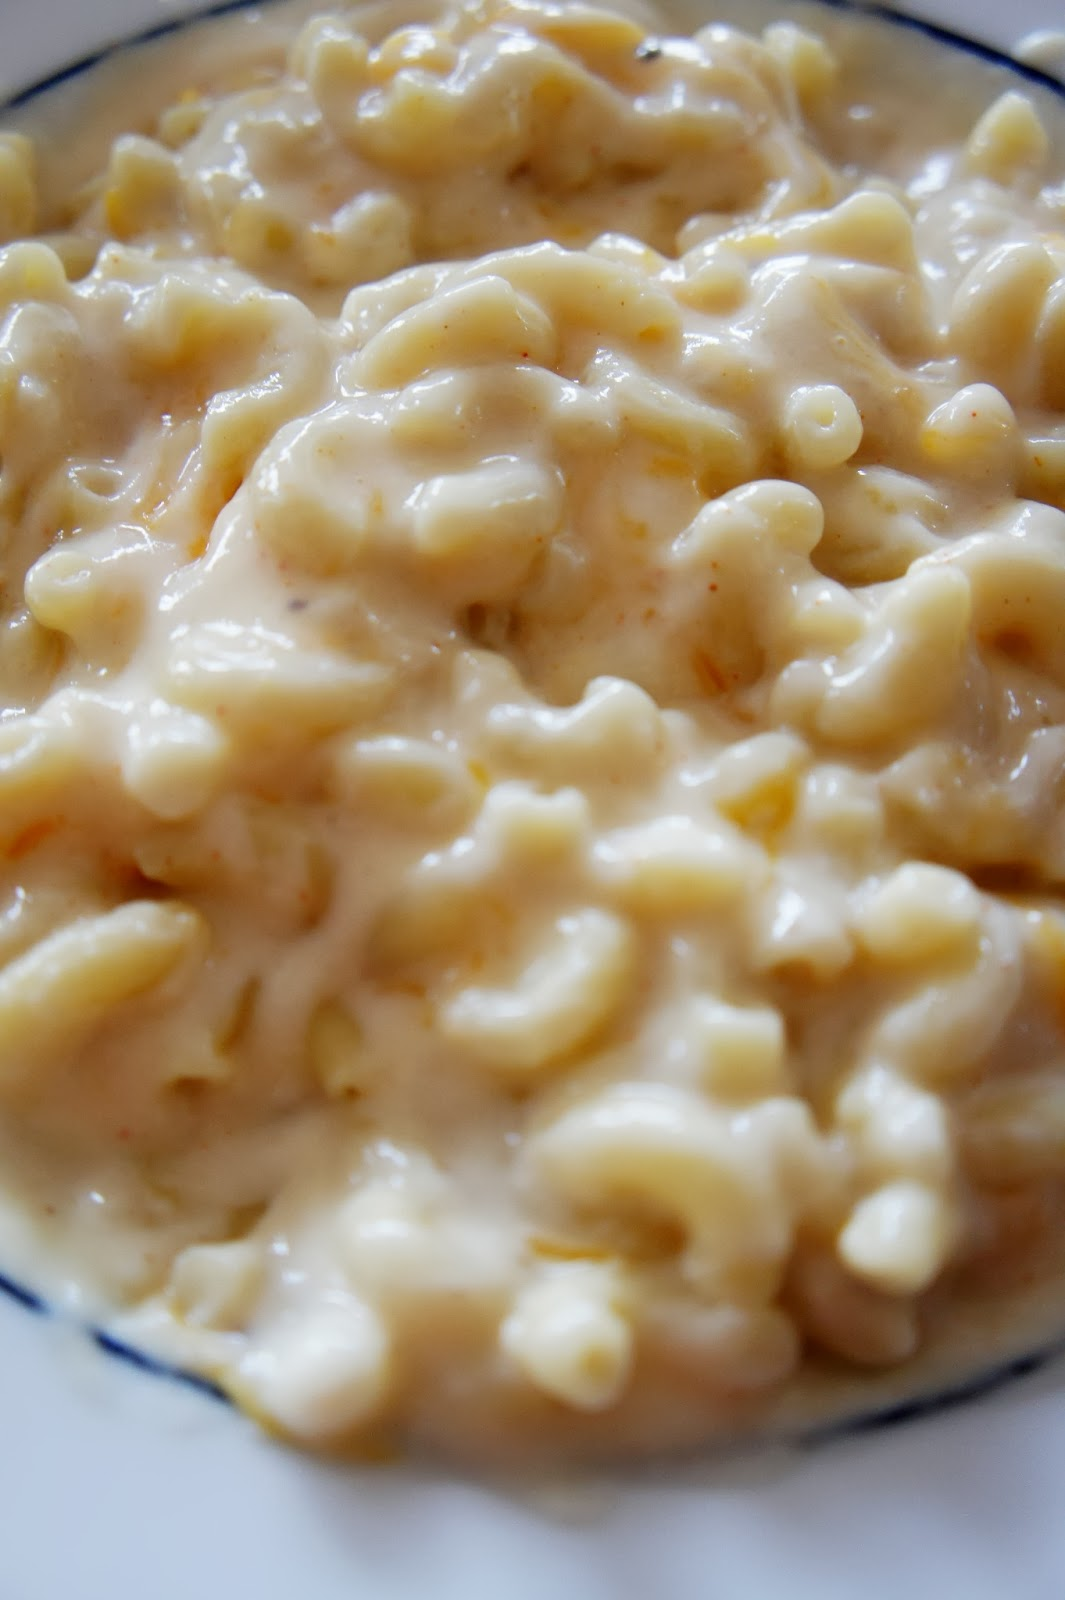 savory sweet and satisfying wisconsin macaroni and cheese